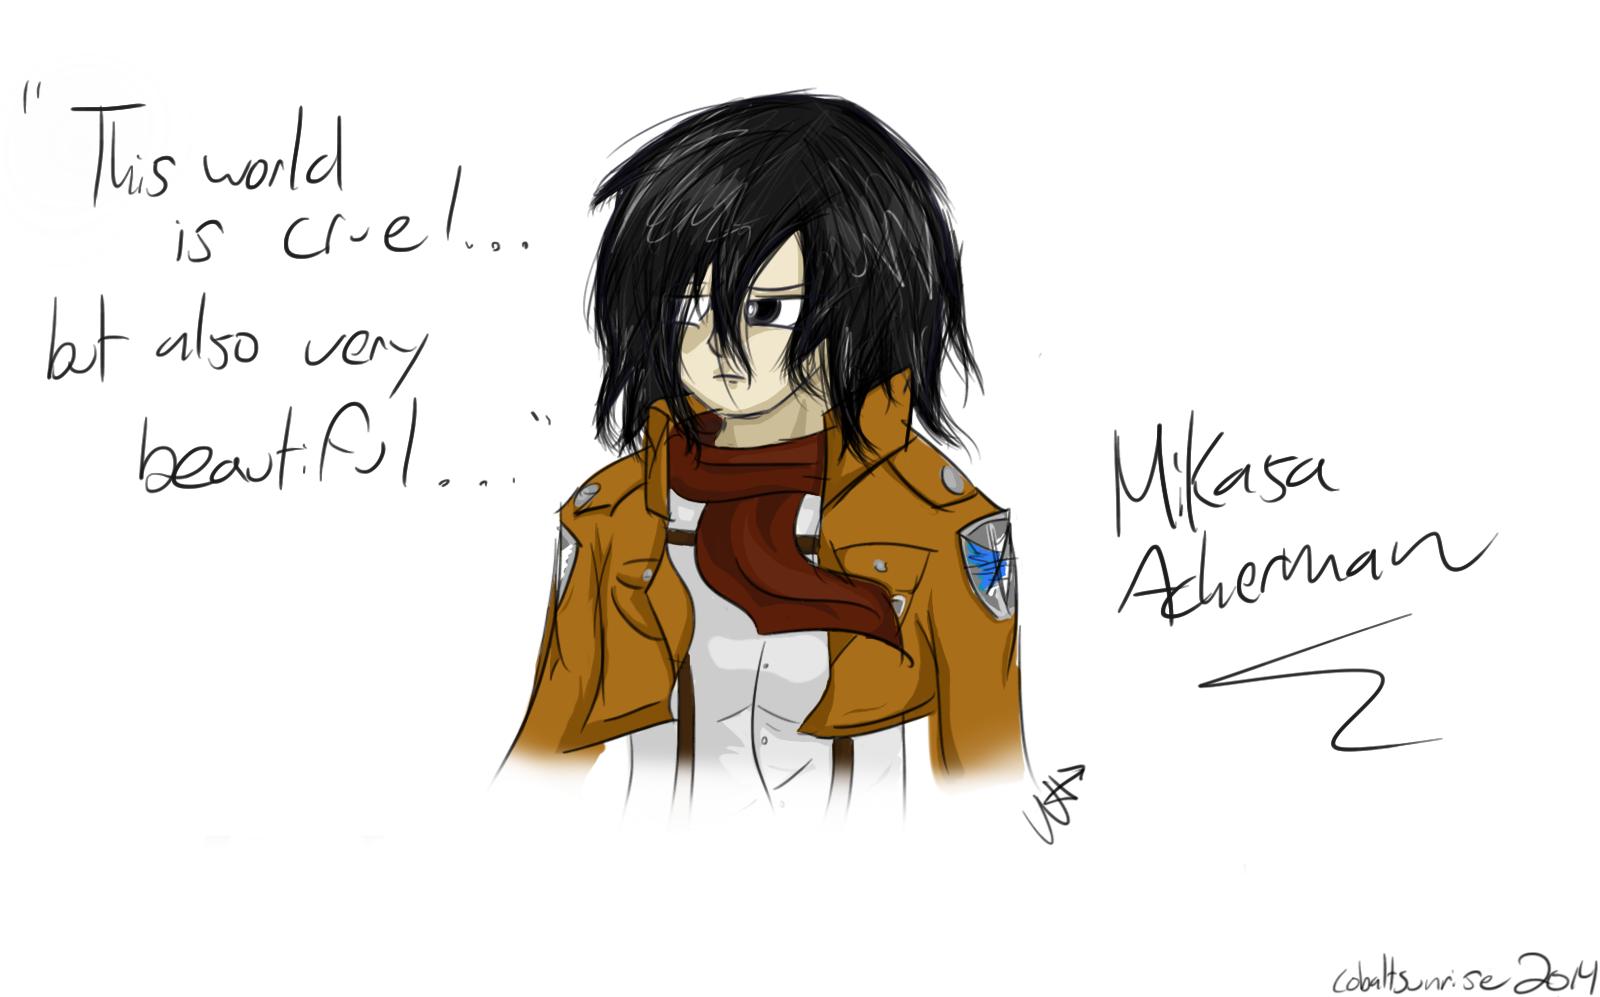 Mikasa ackerman by cobaltsunrise on deviantart - Mikasa es su casa ...